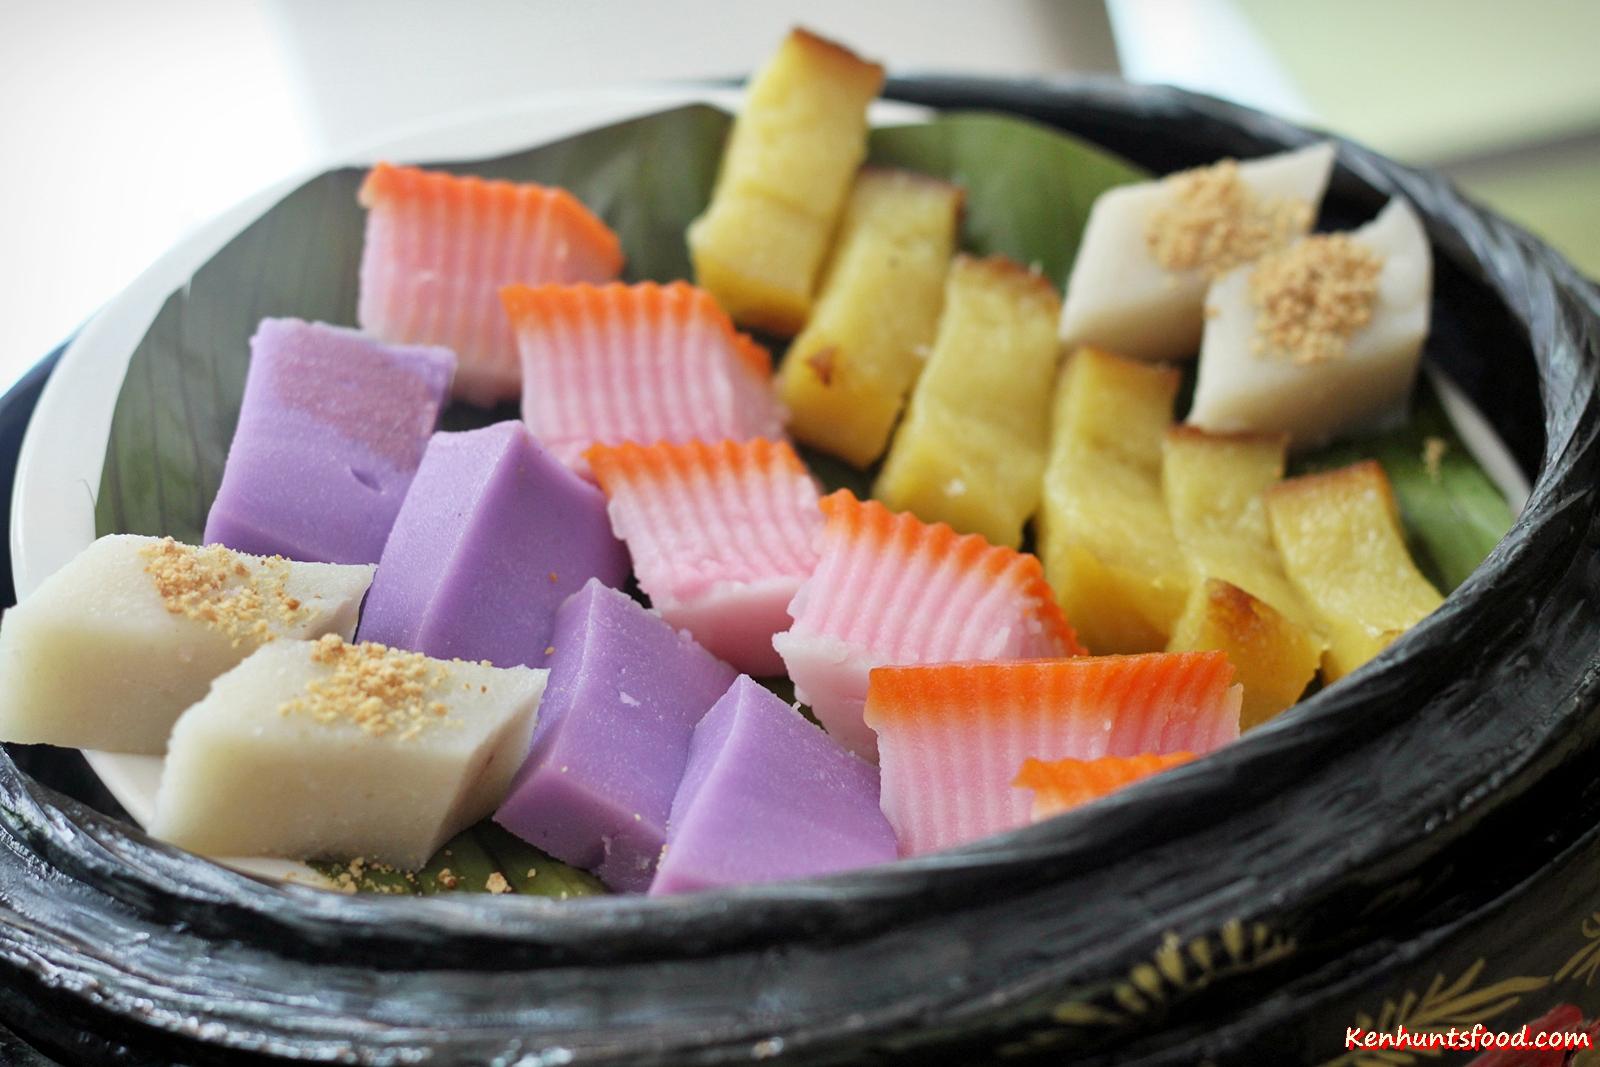 nyonya kuih peranakan assorted penang cuisine food brasserie swez breakfast cake alternatives eat outside eastin hotel